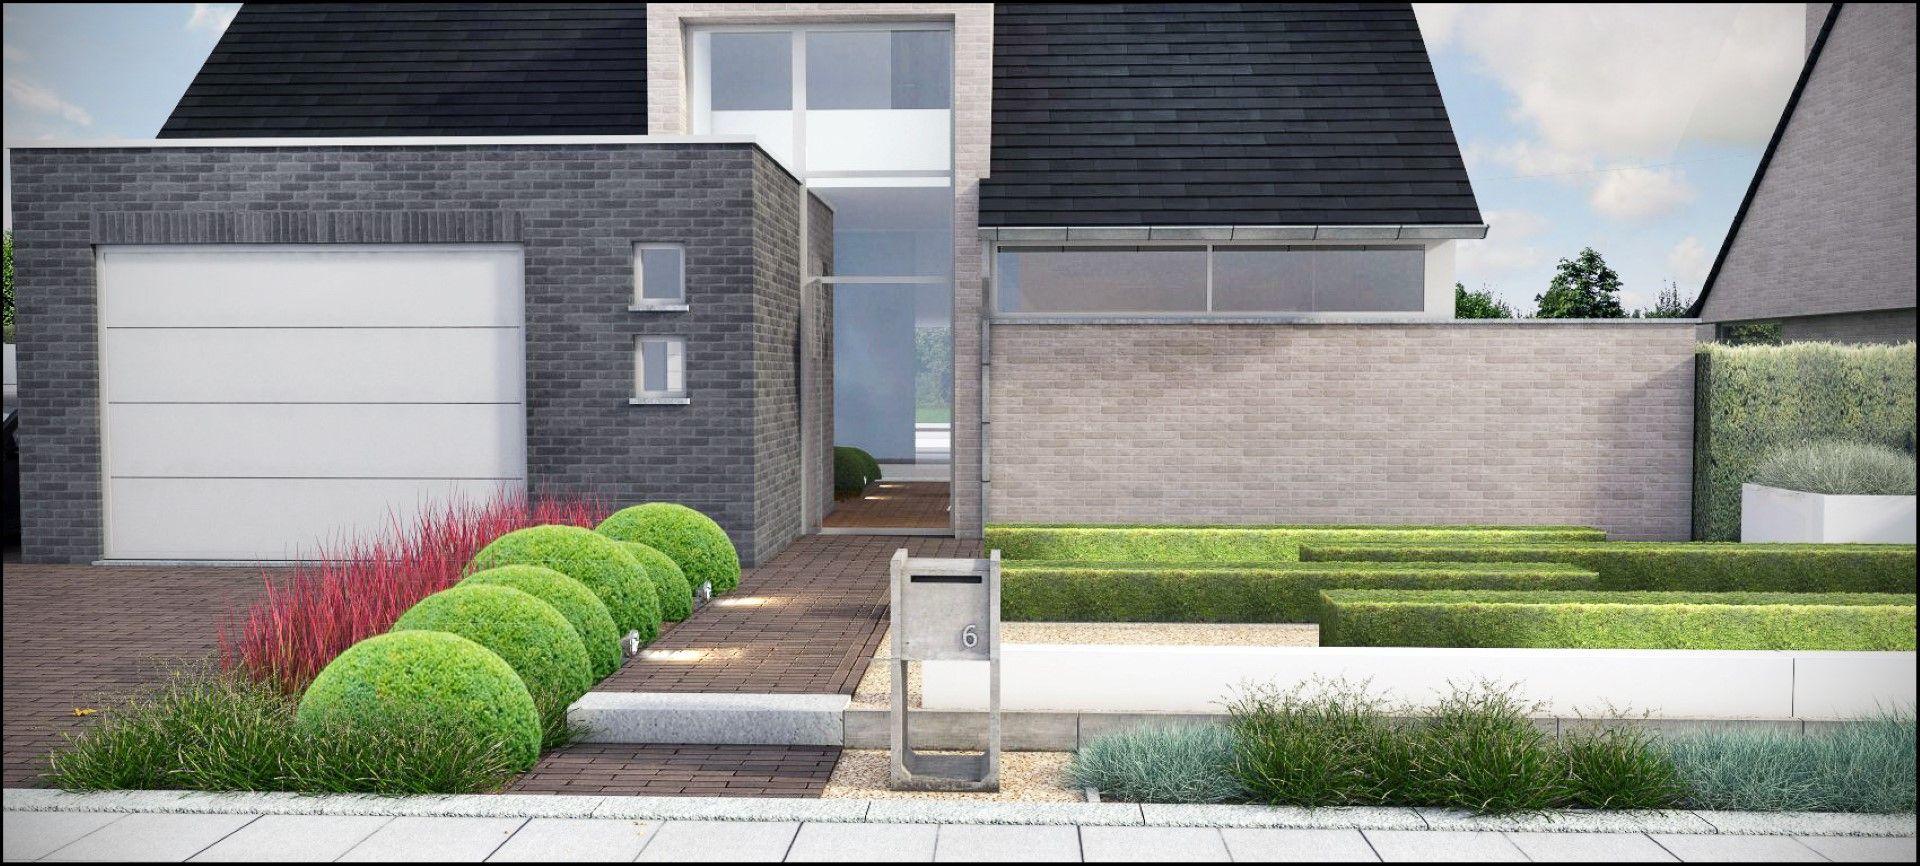 Eco tuinarchitectengroep 3d projecten moderne tuin for Voortuin modern